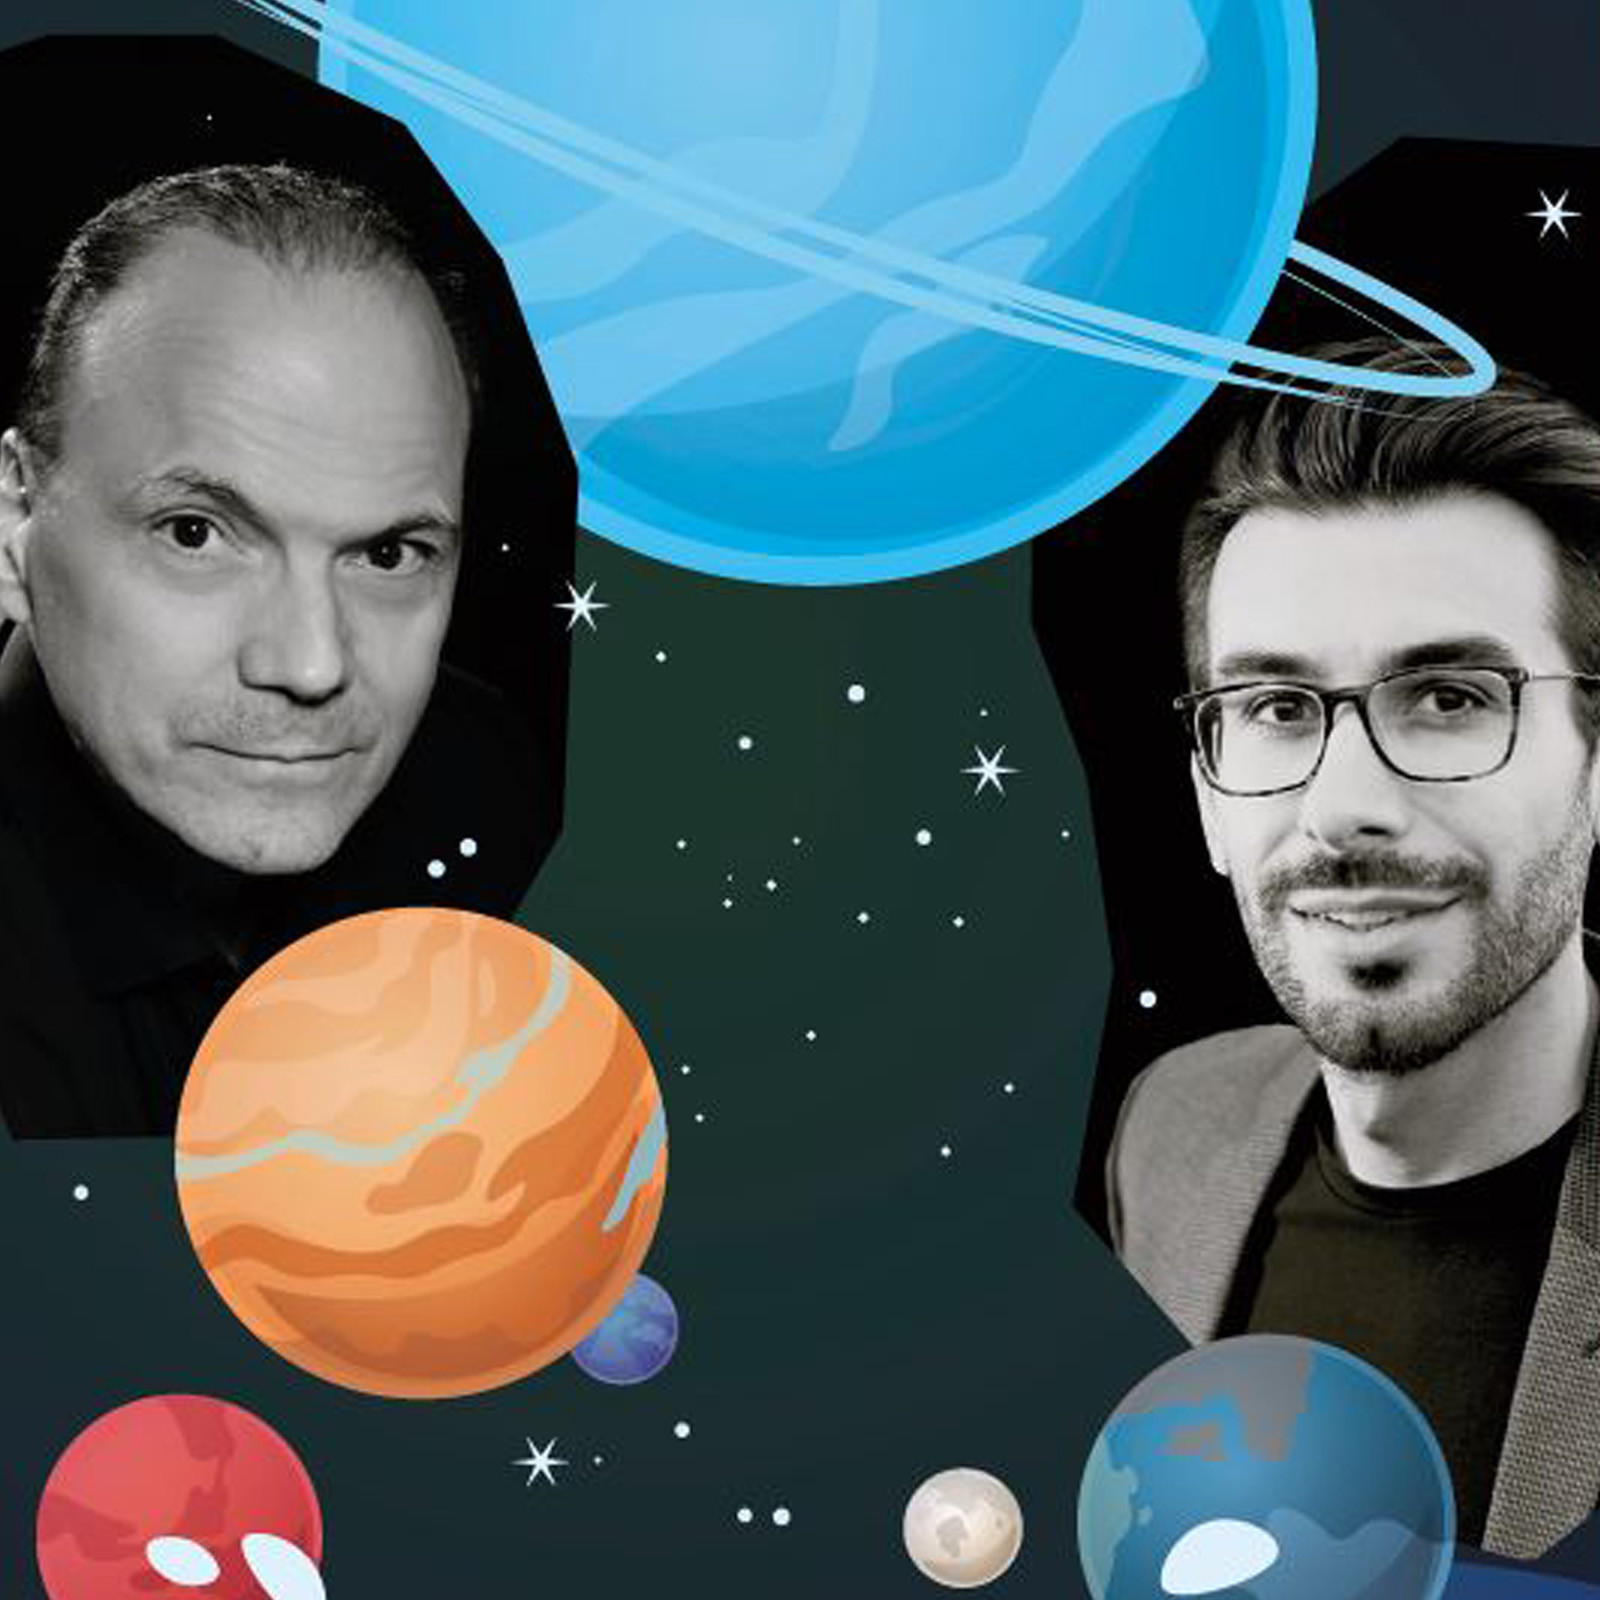 L'astrologie mondiale